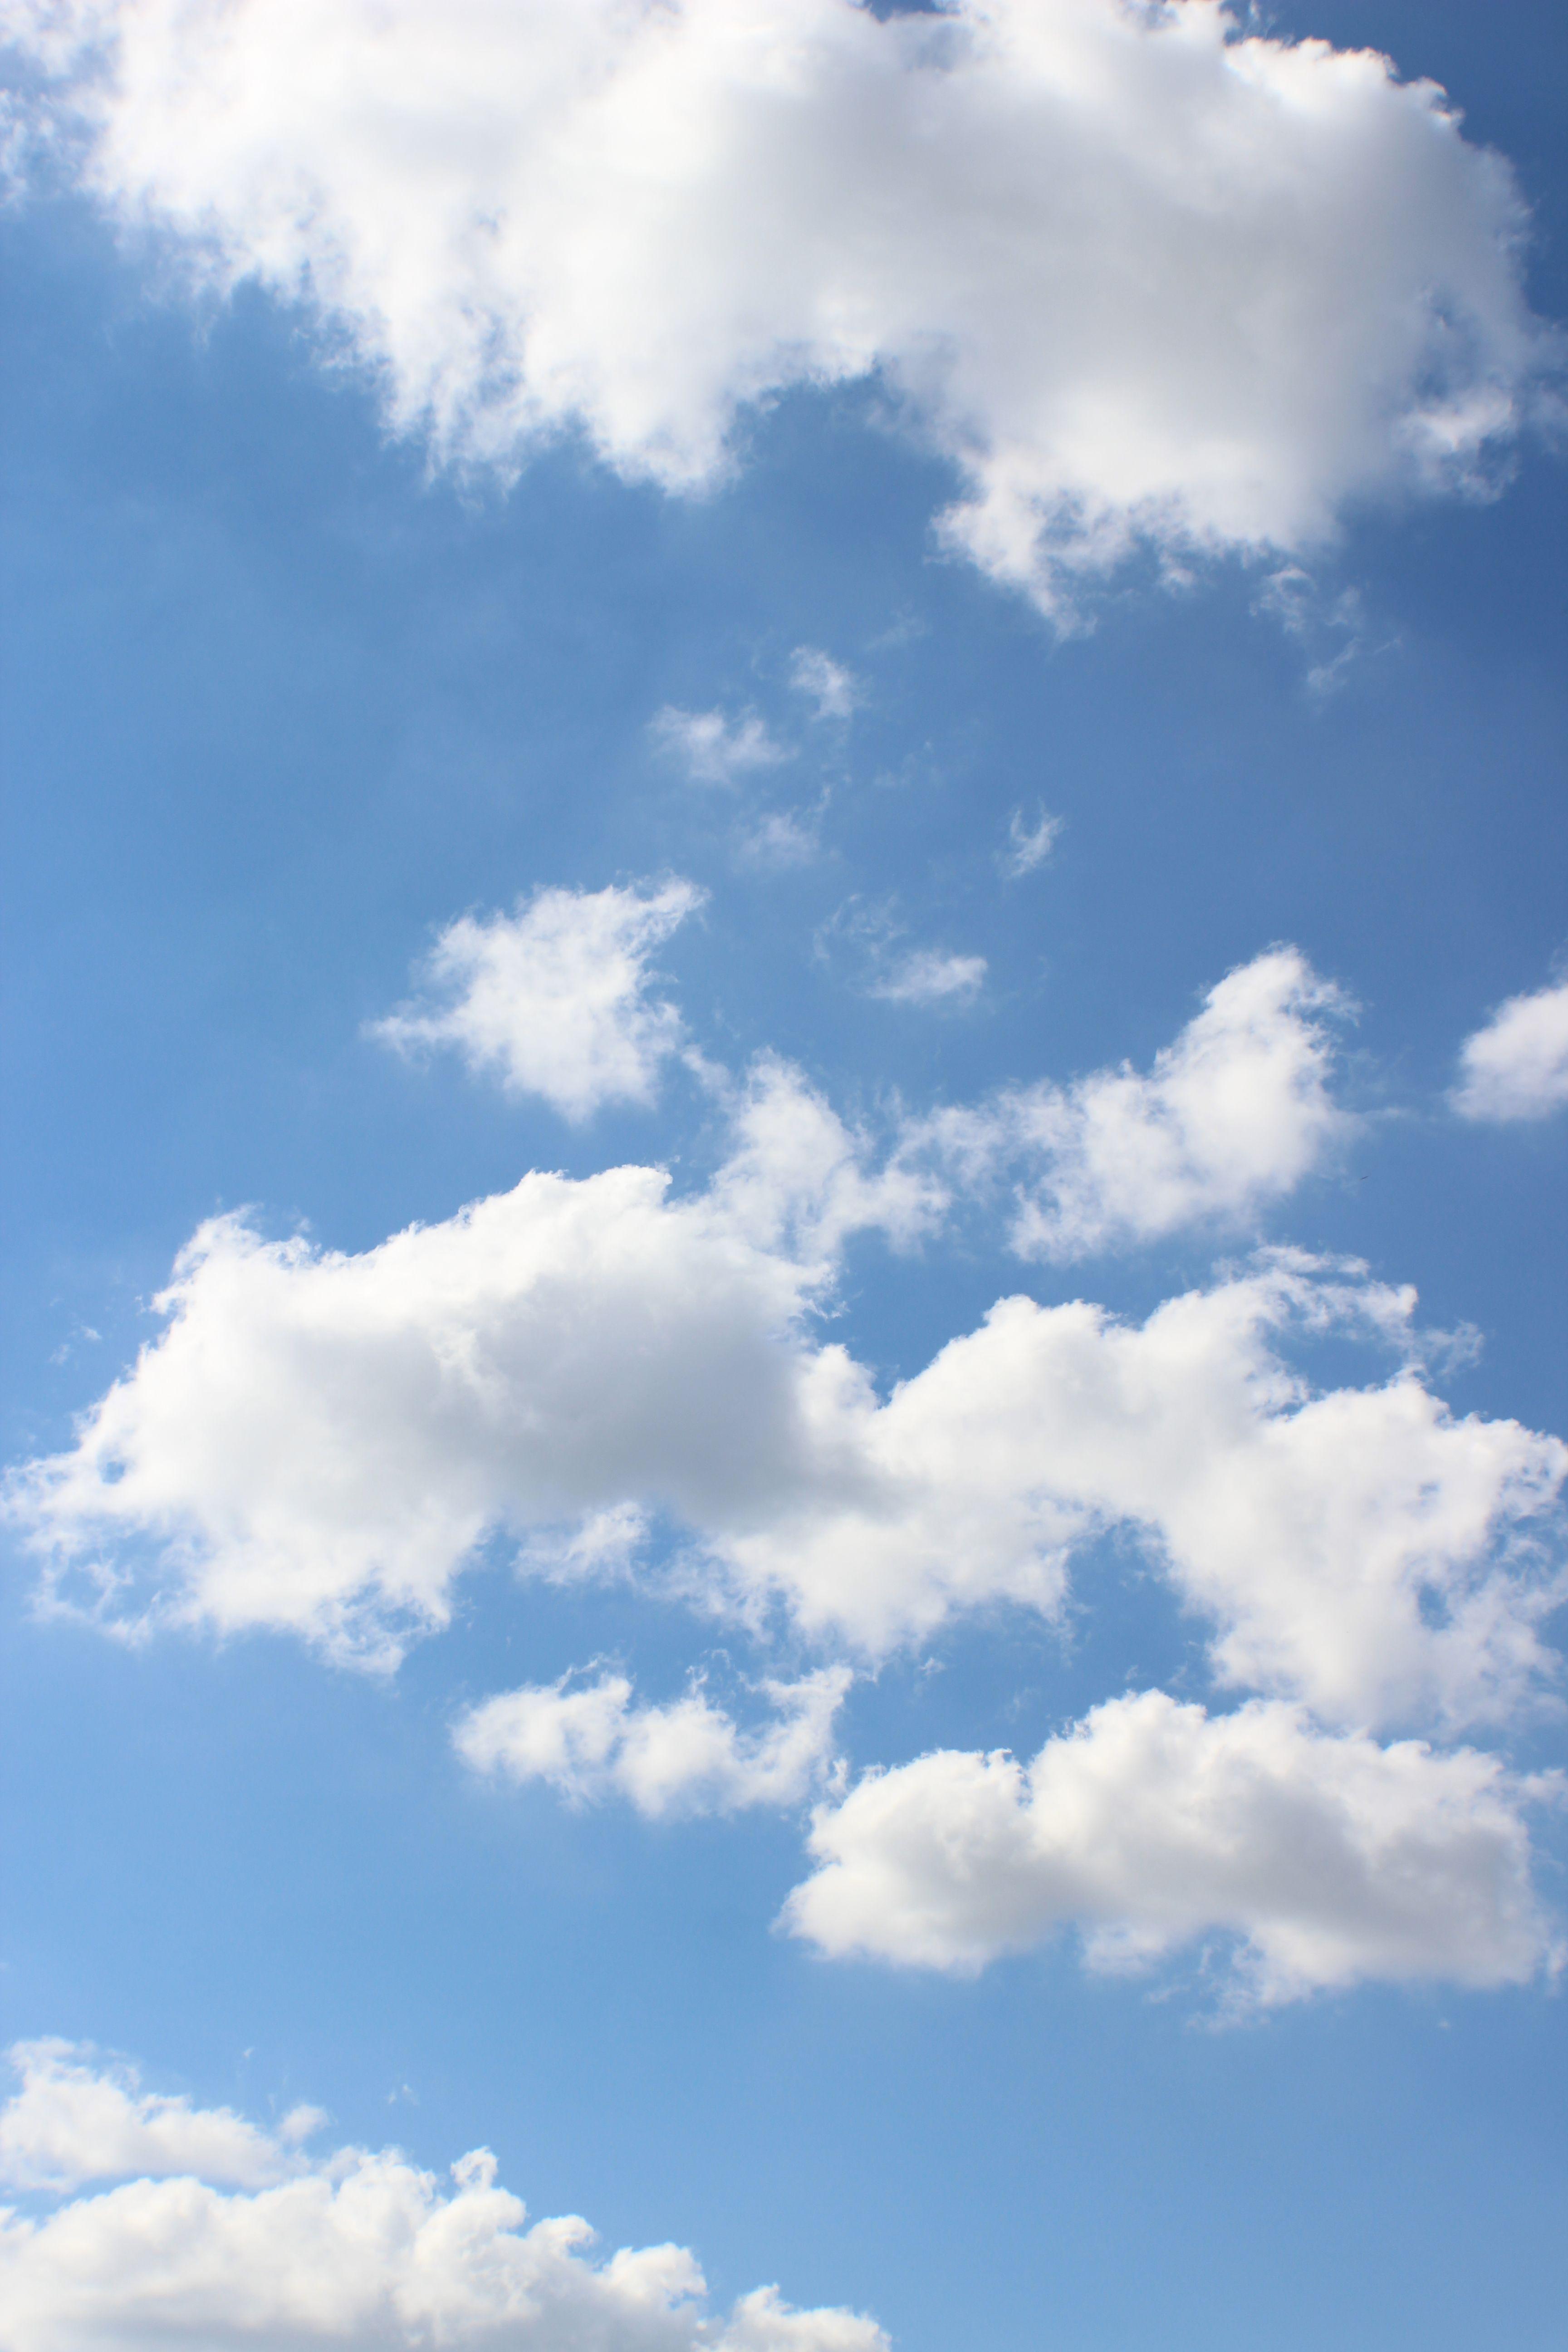 Blue Sky Aesthetic Background